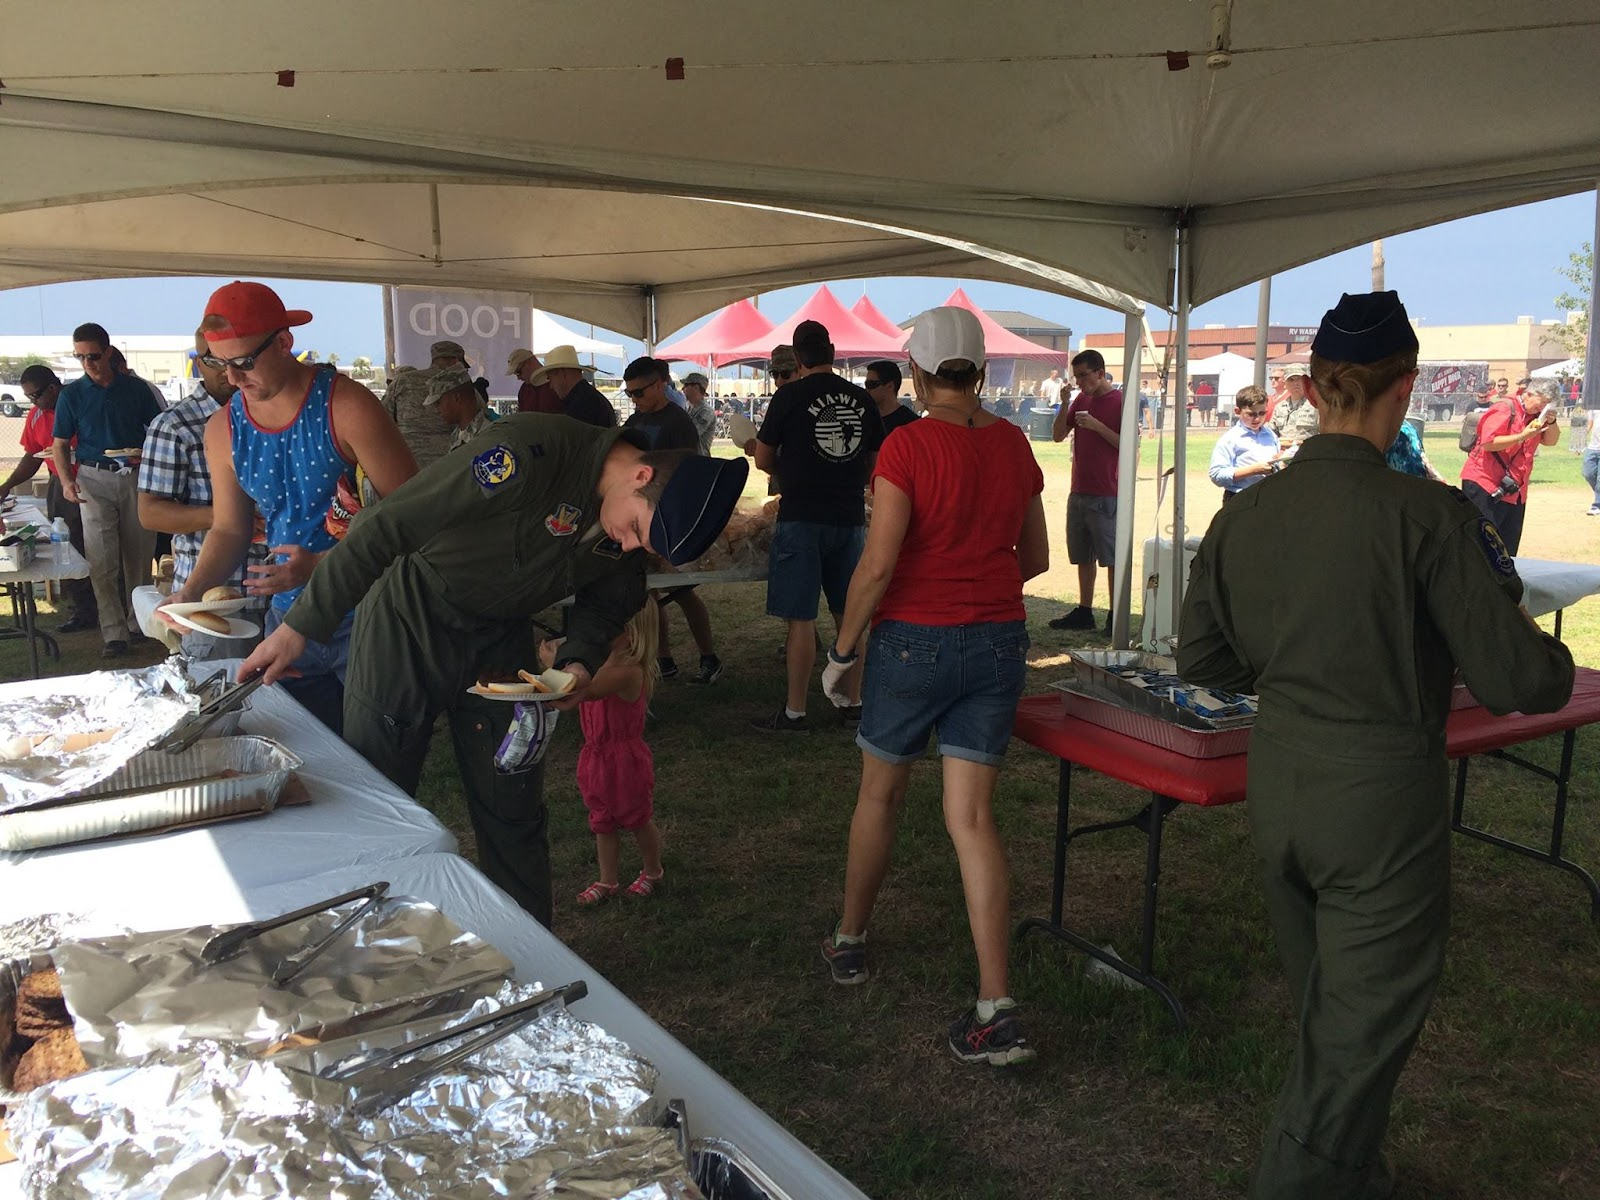 Tucson Thanks our Airmen and Families - 11893139_890712574336190_1083826506416371380_o.jpg